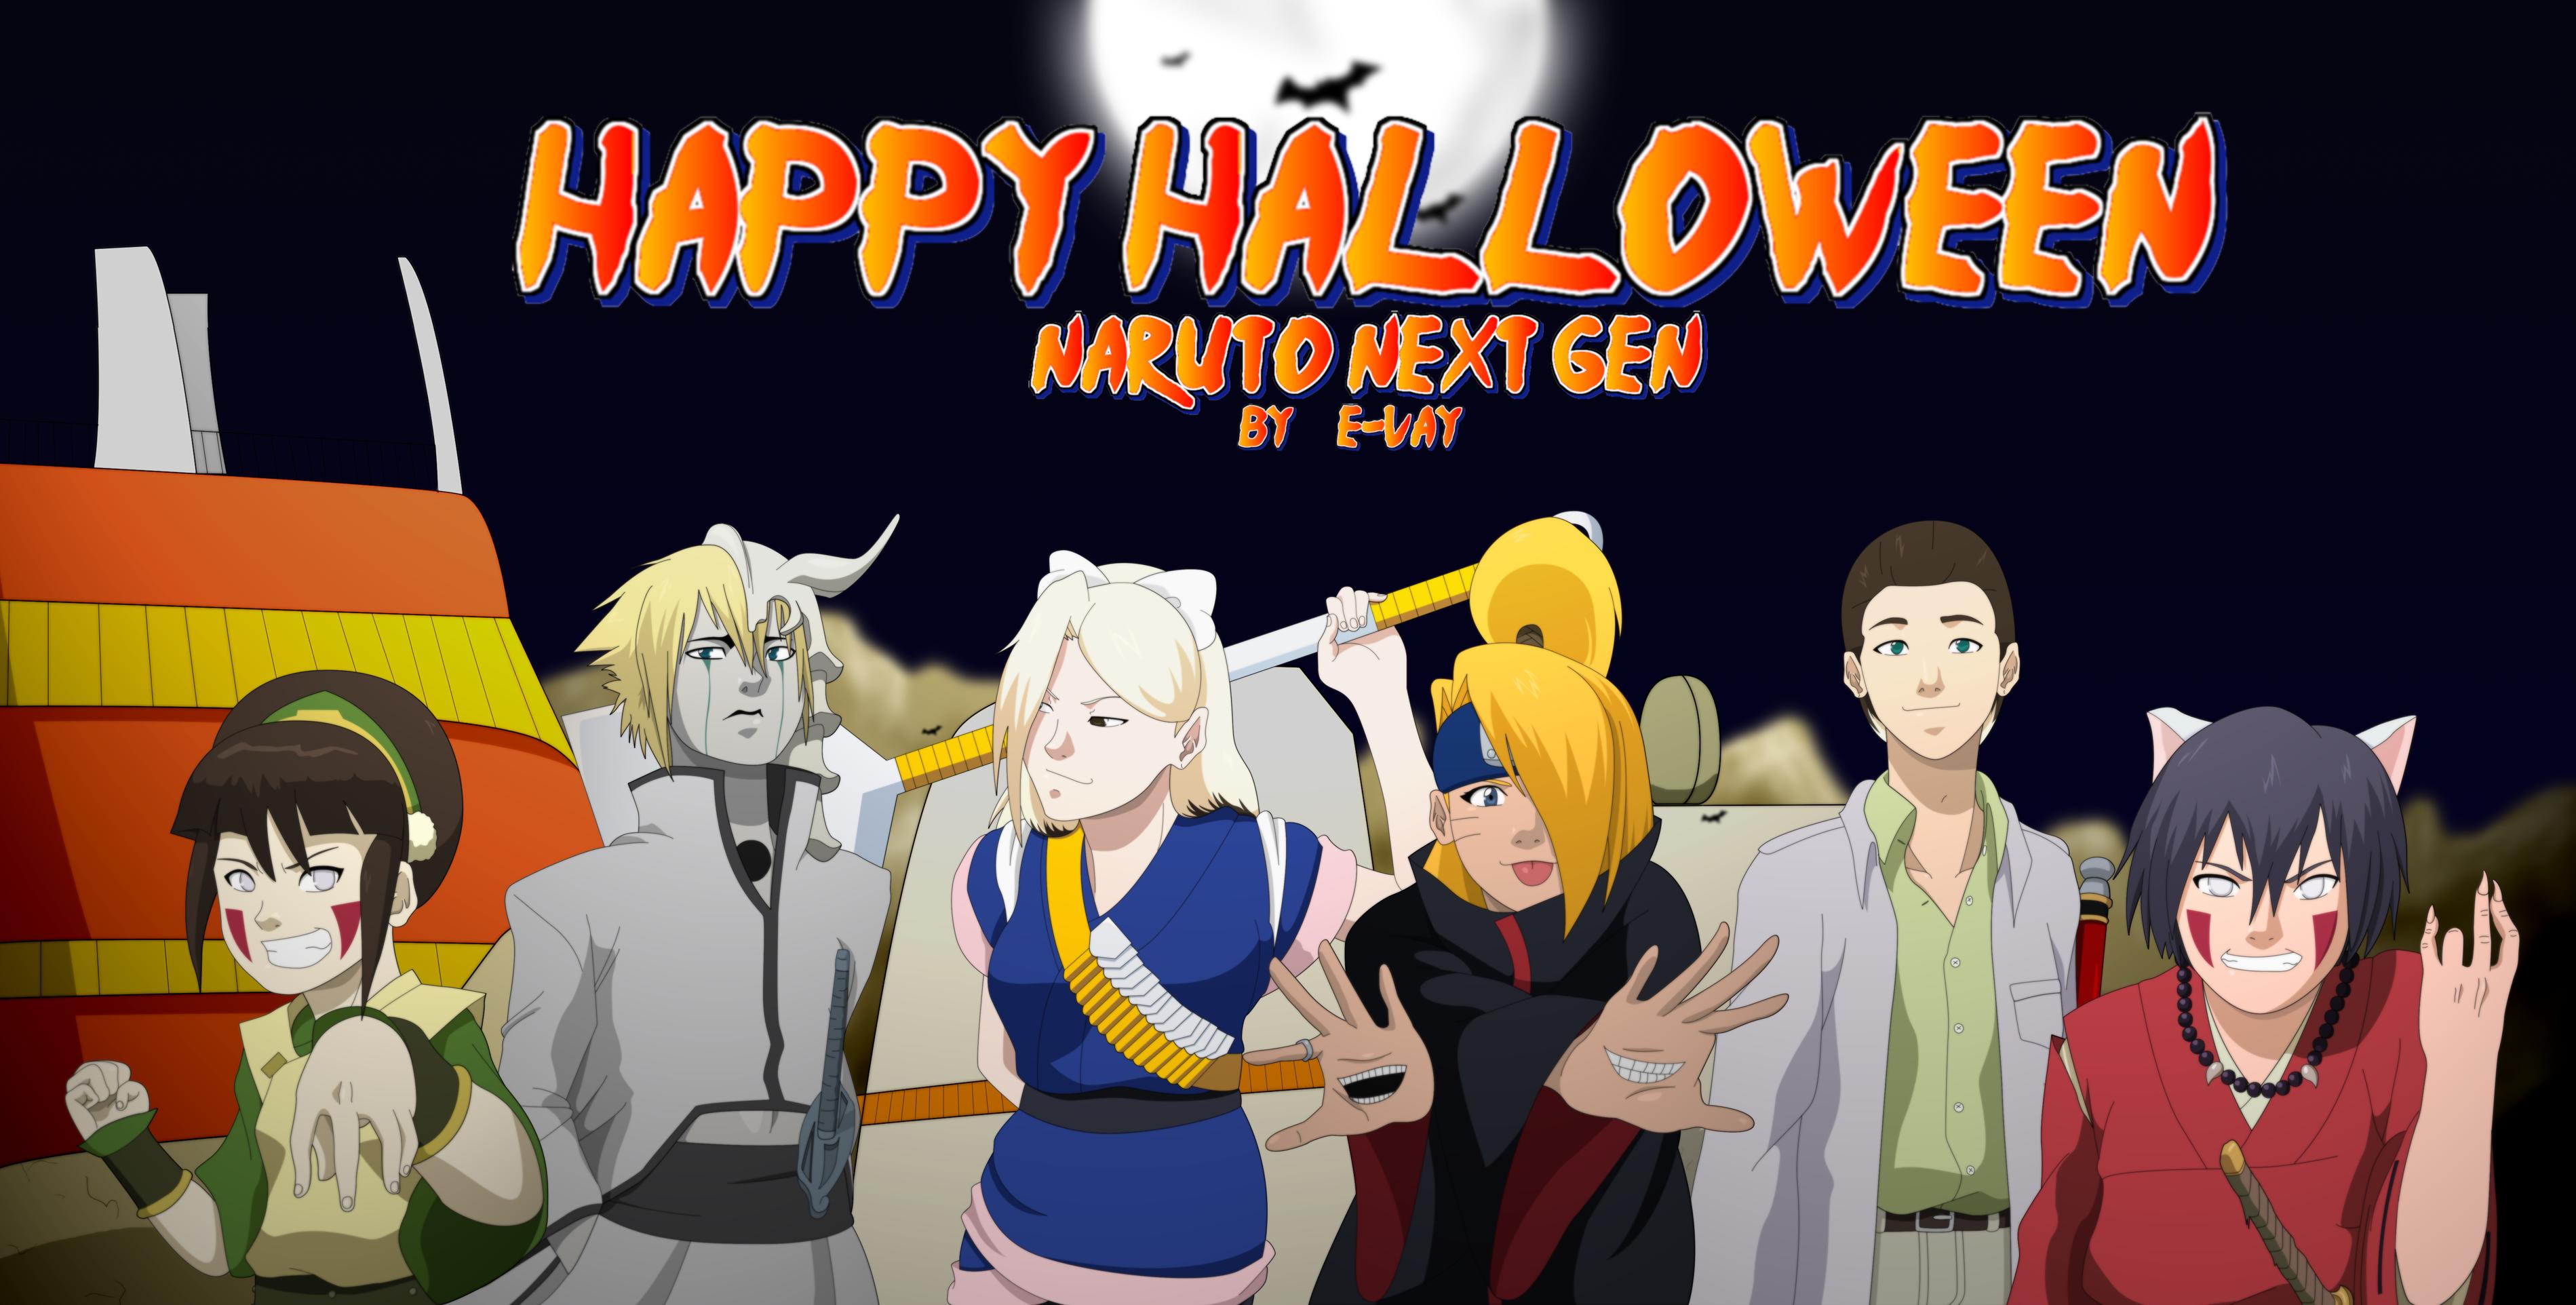 http://fc79.deviantart.com/fs19/f/2007/296/a/d/Naruto__Next_Gen_Halloween_by_SractheNinja.png